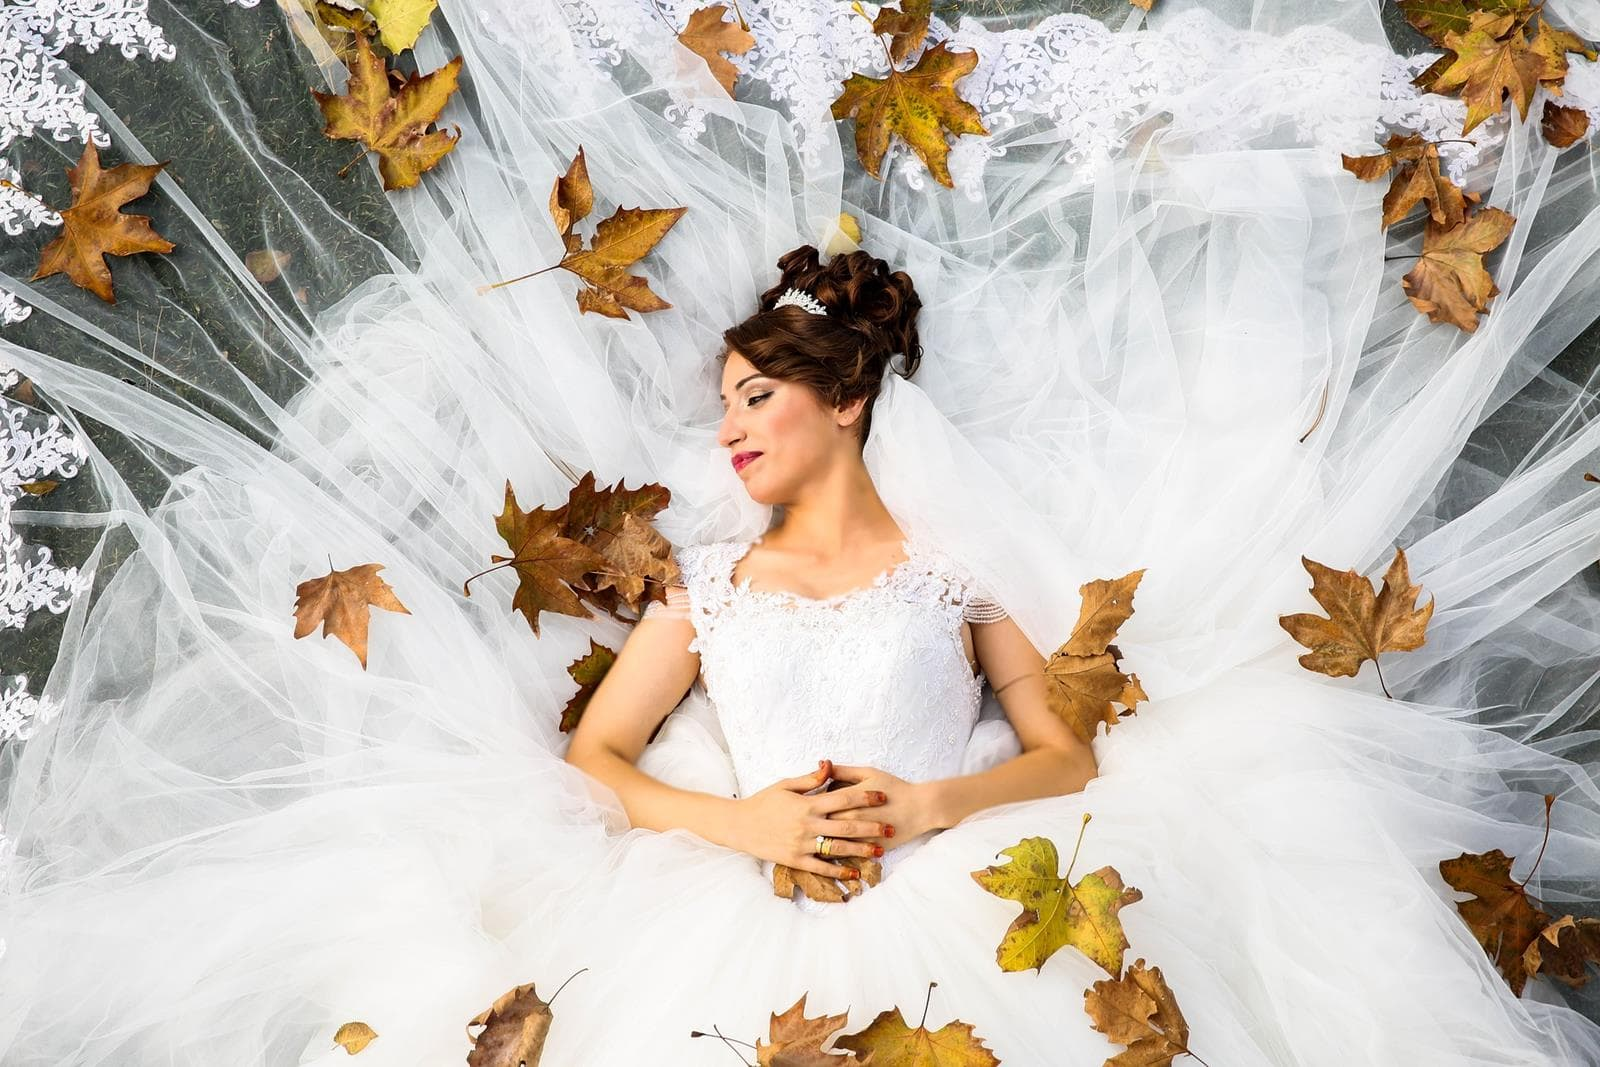 Matrimonio Tema Natura : Matrimonio a tema natura per la sposa